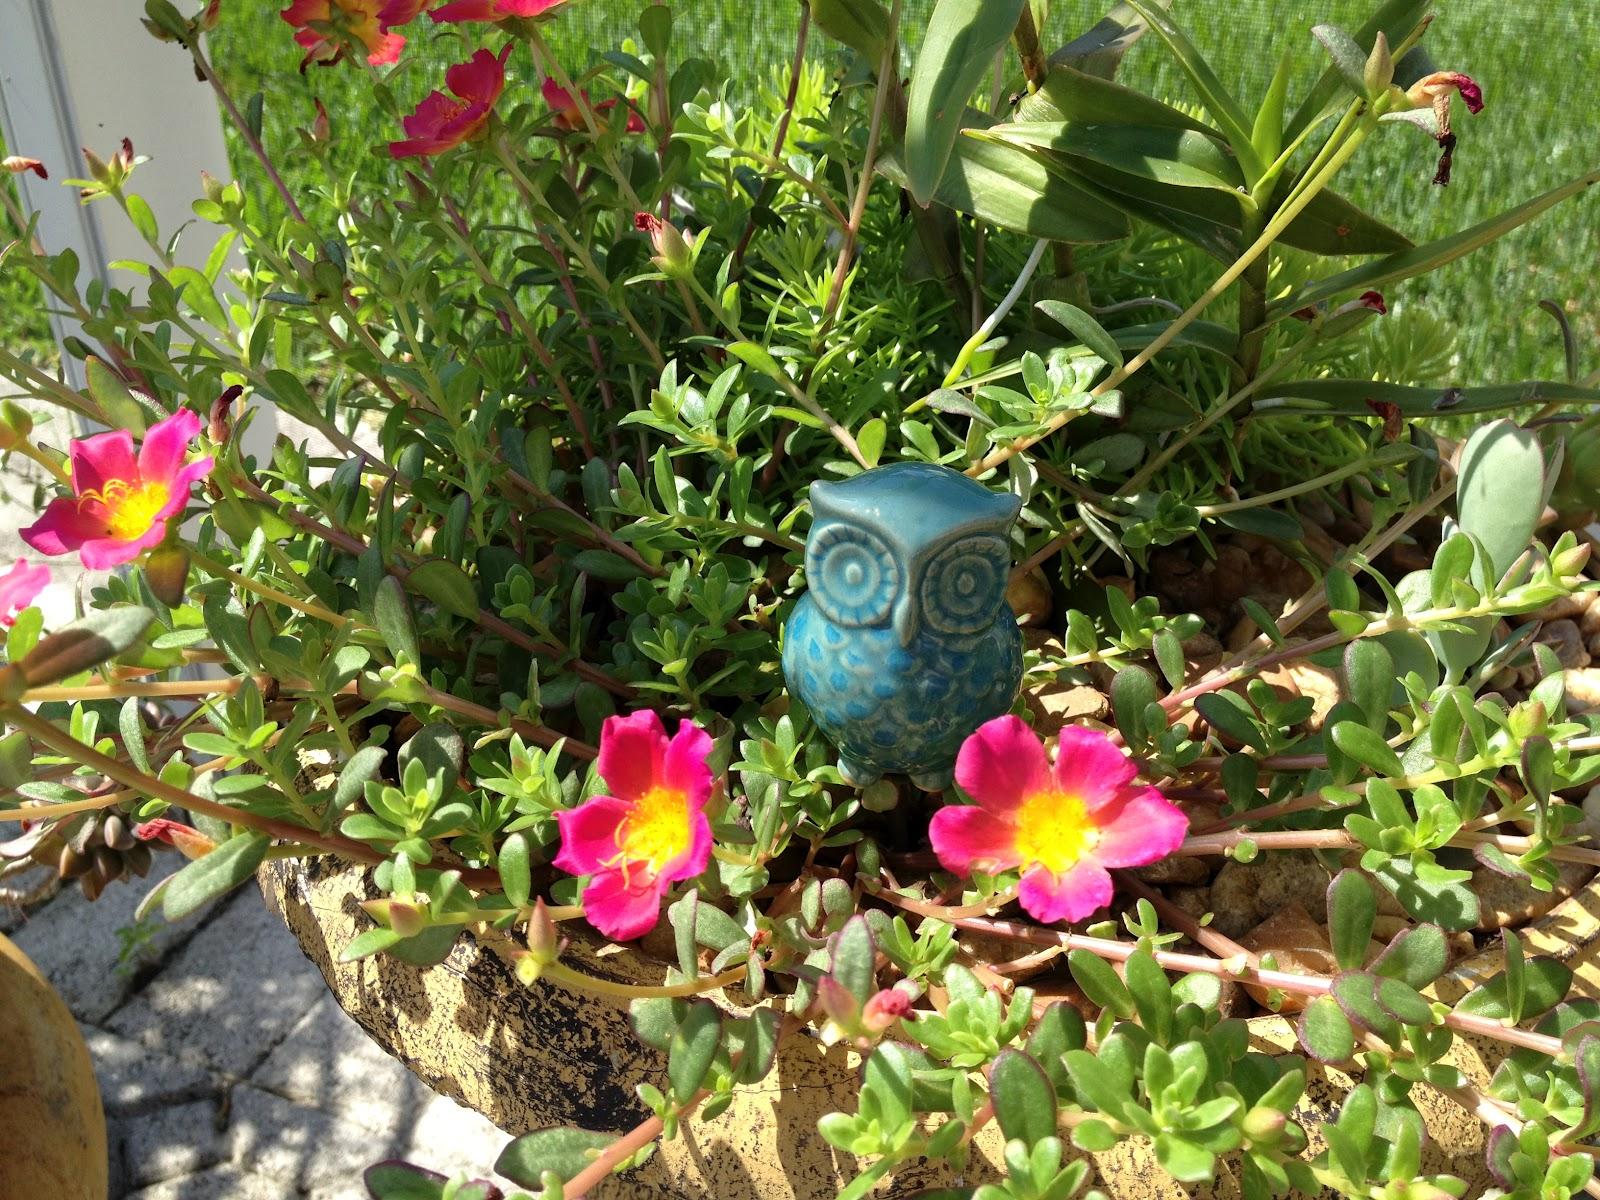 Inspire Bohemia: Decorative Owl and Mushroom Garden Planter Stakes